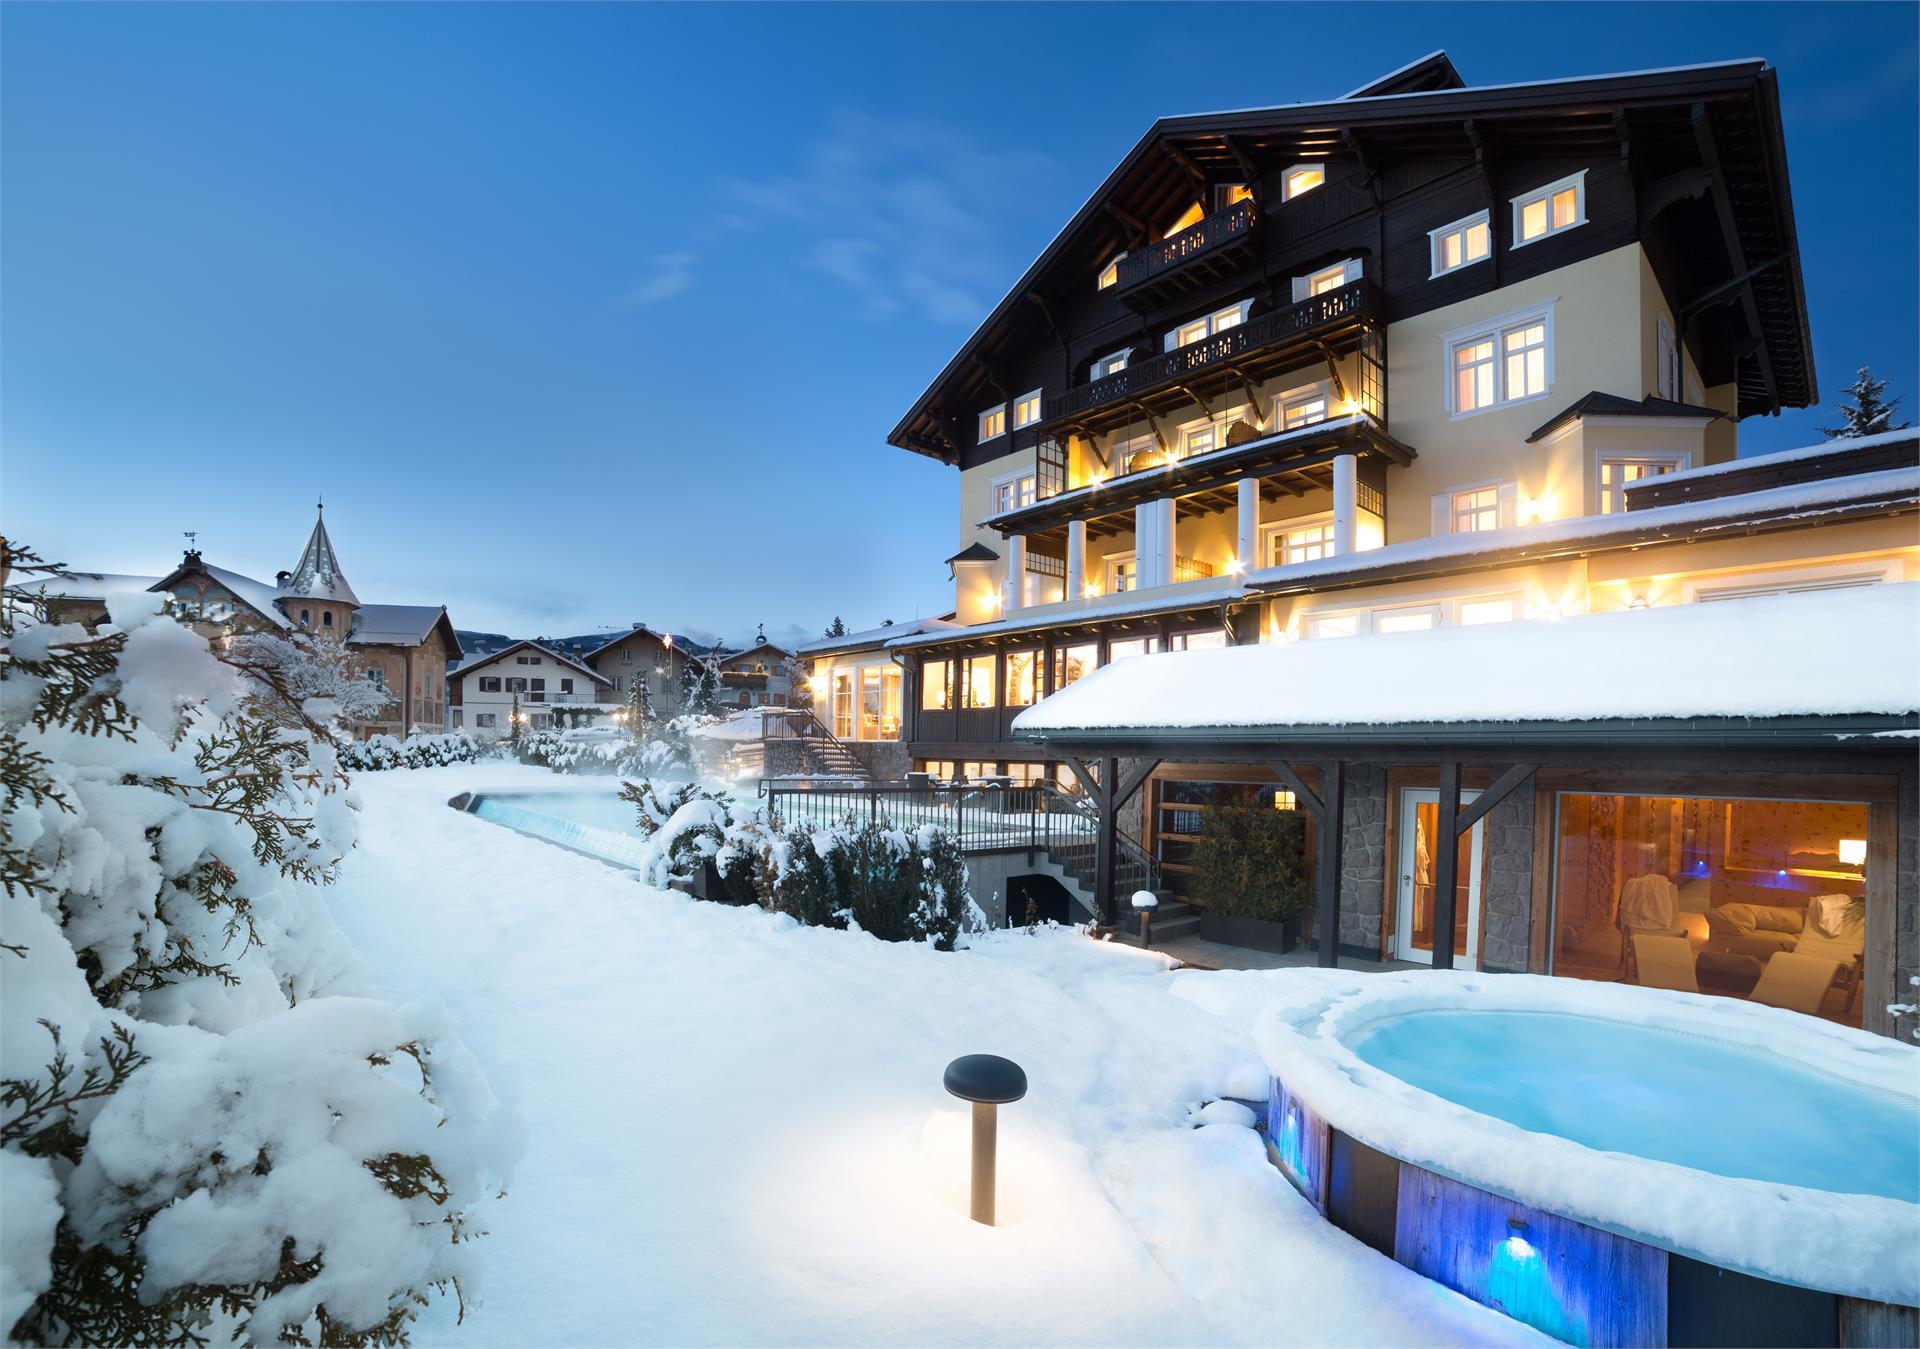 Hotel Villa Kastelruth - Winter in denDolomiten